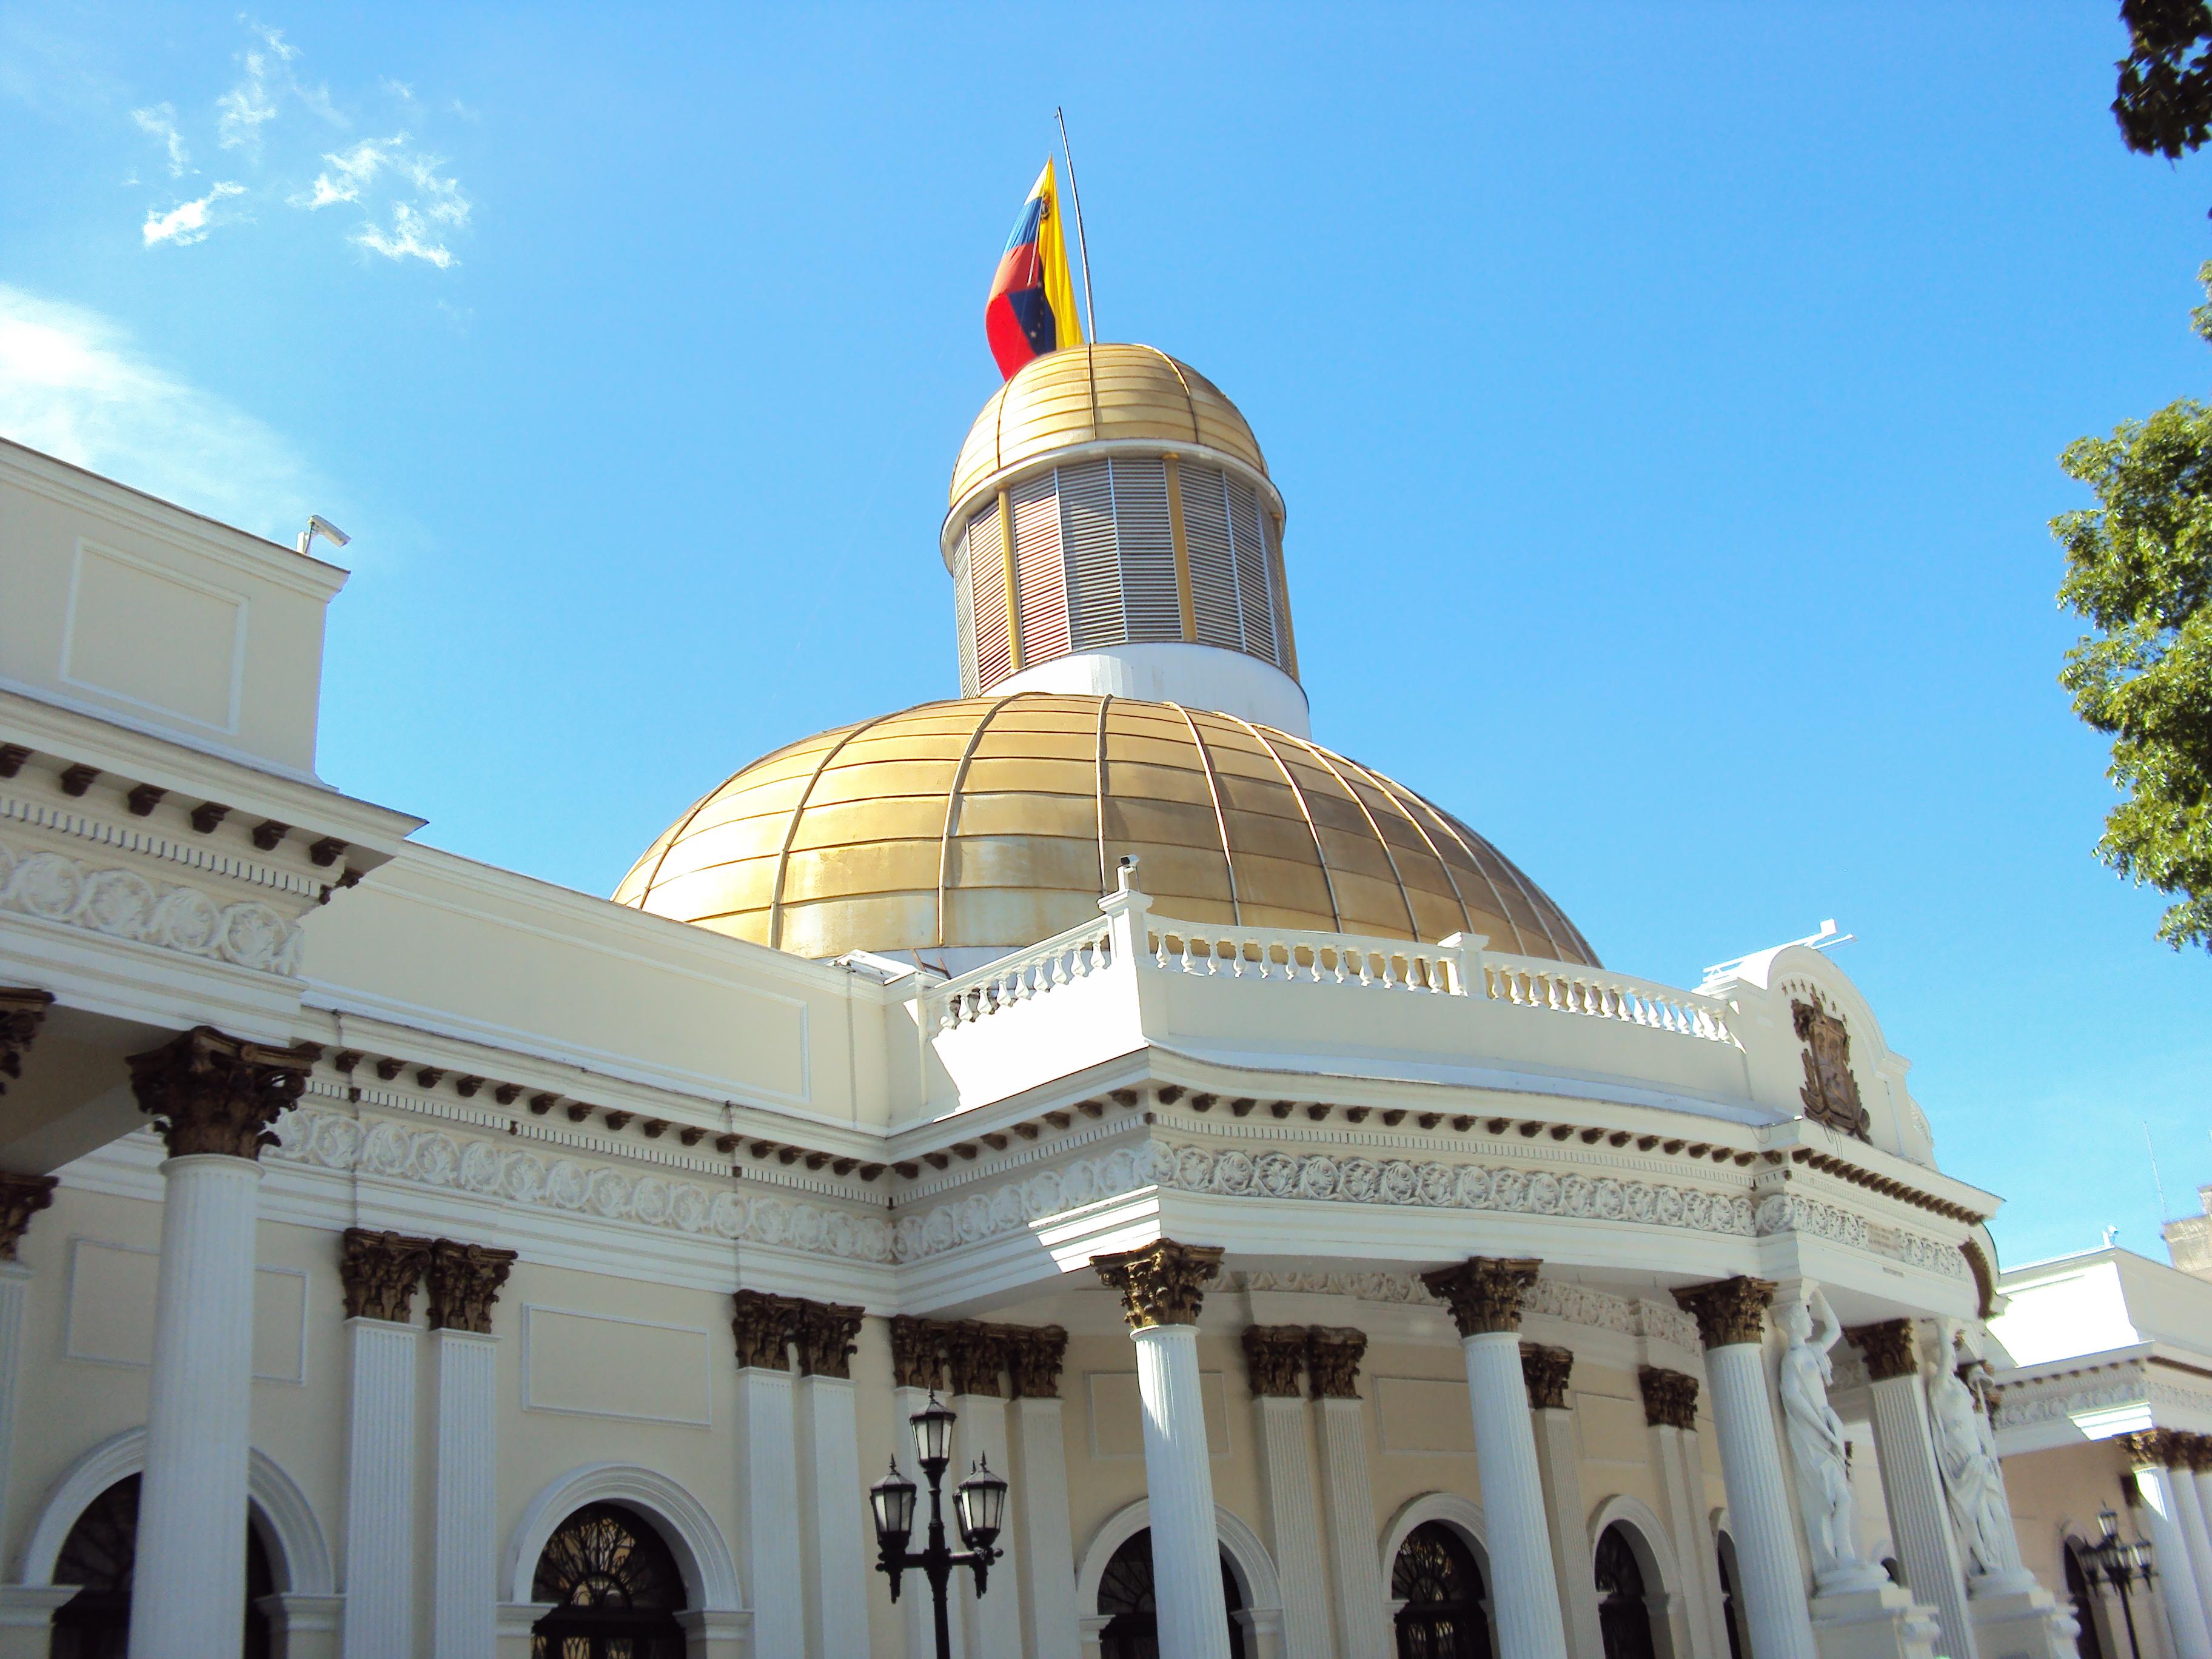 Felicita Esteban Lazo al Presidente de la Asamblea Nacional de Venezuela